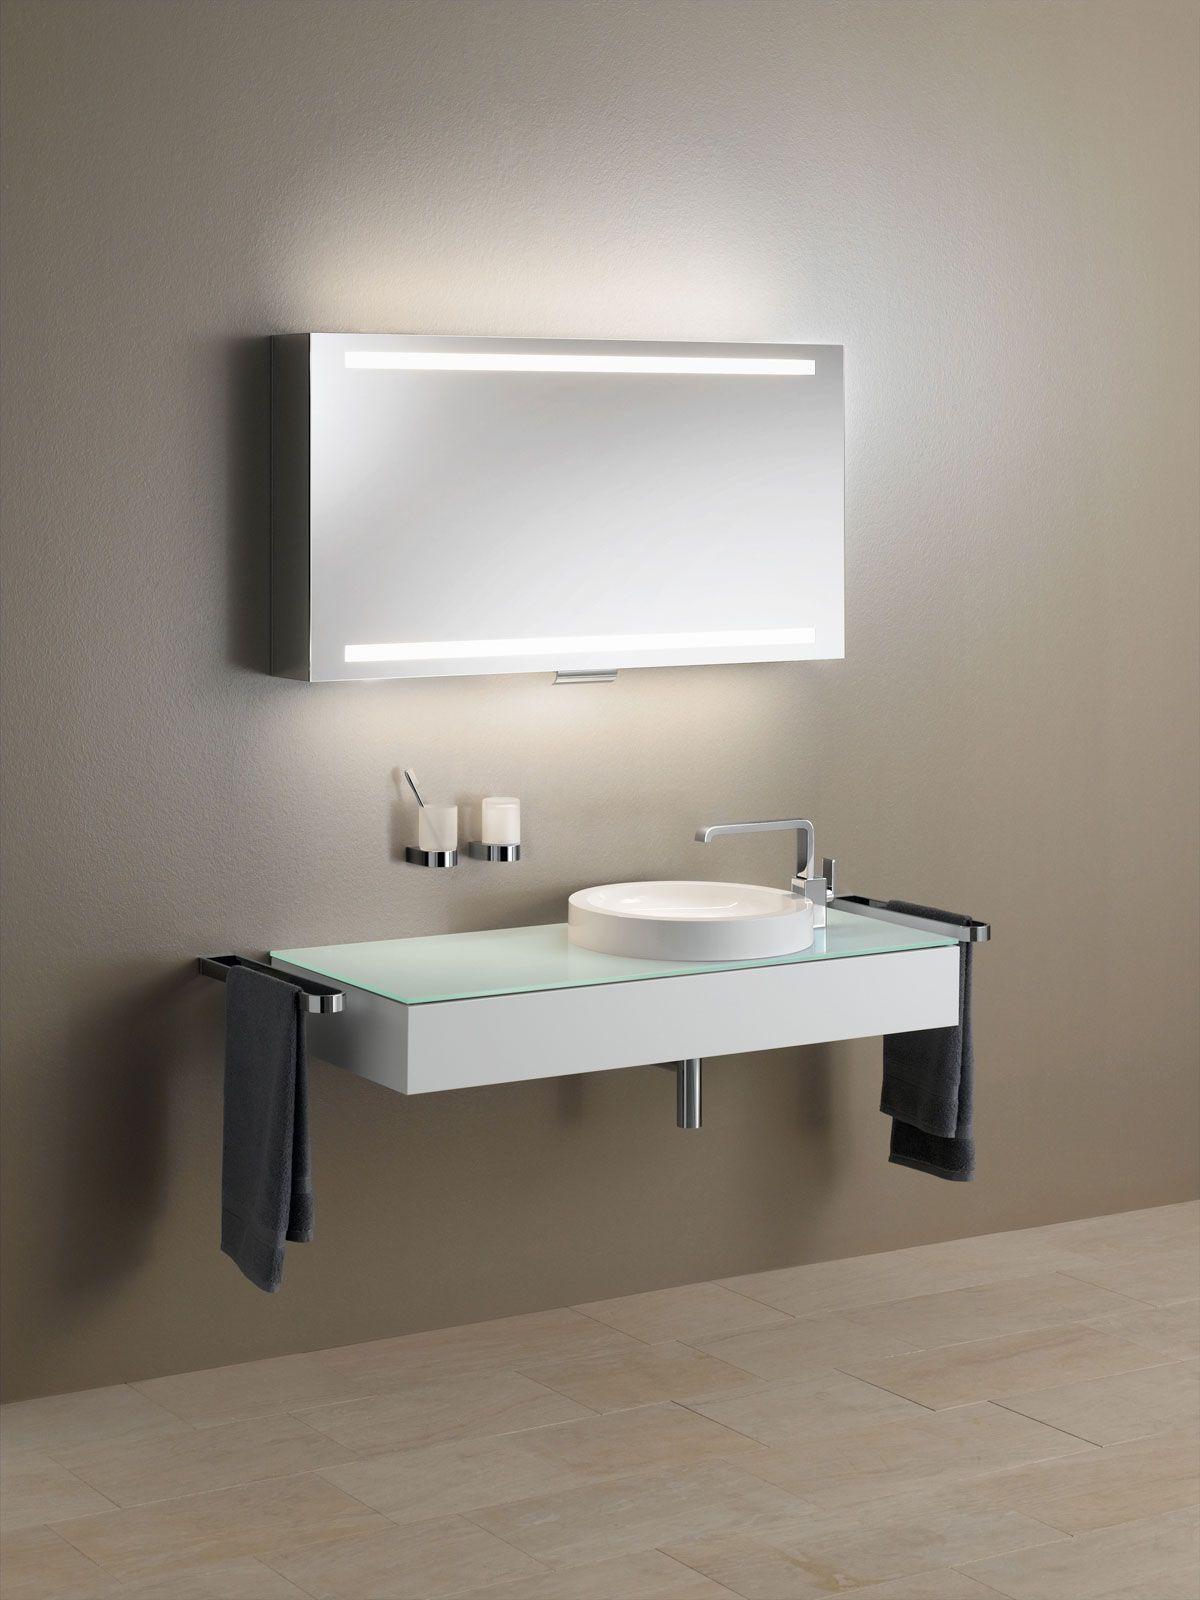 Keuco Edition 300 Furniture Range Bathroom accessories